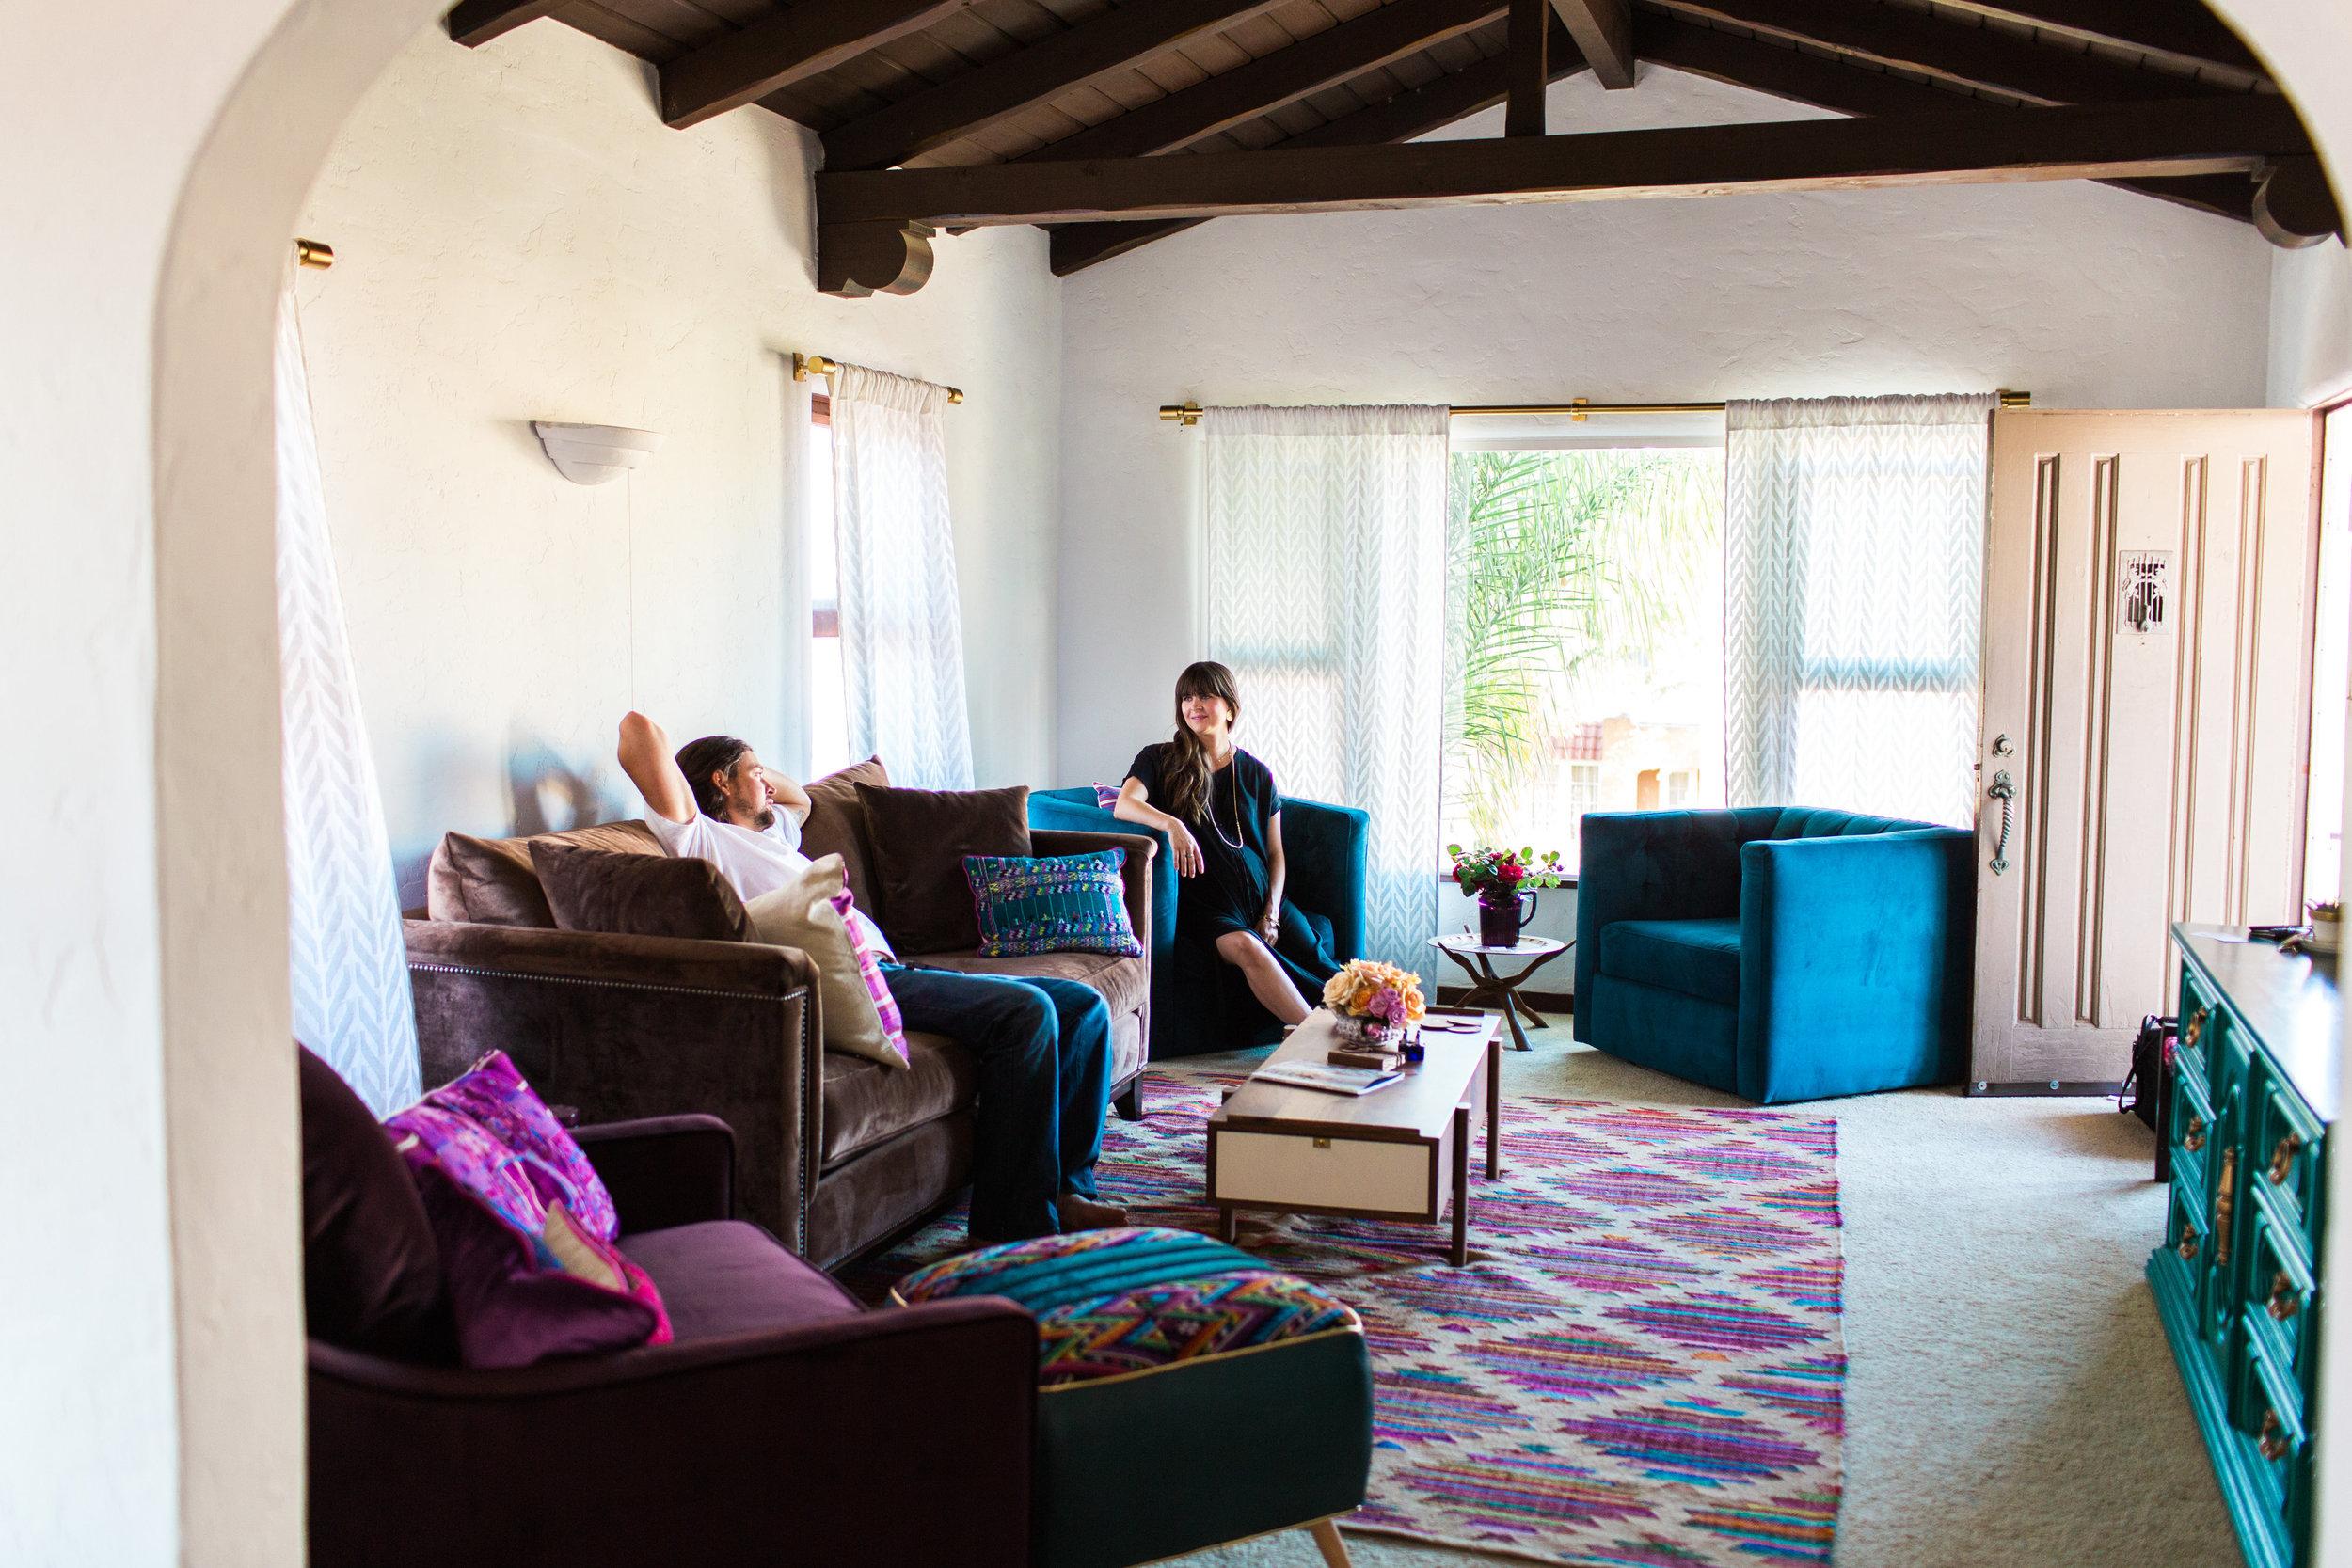 luke and lindsey in living room beams